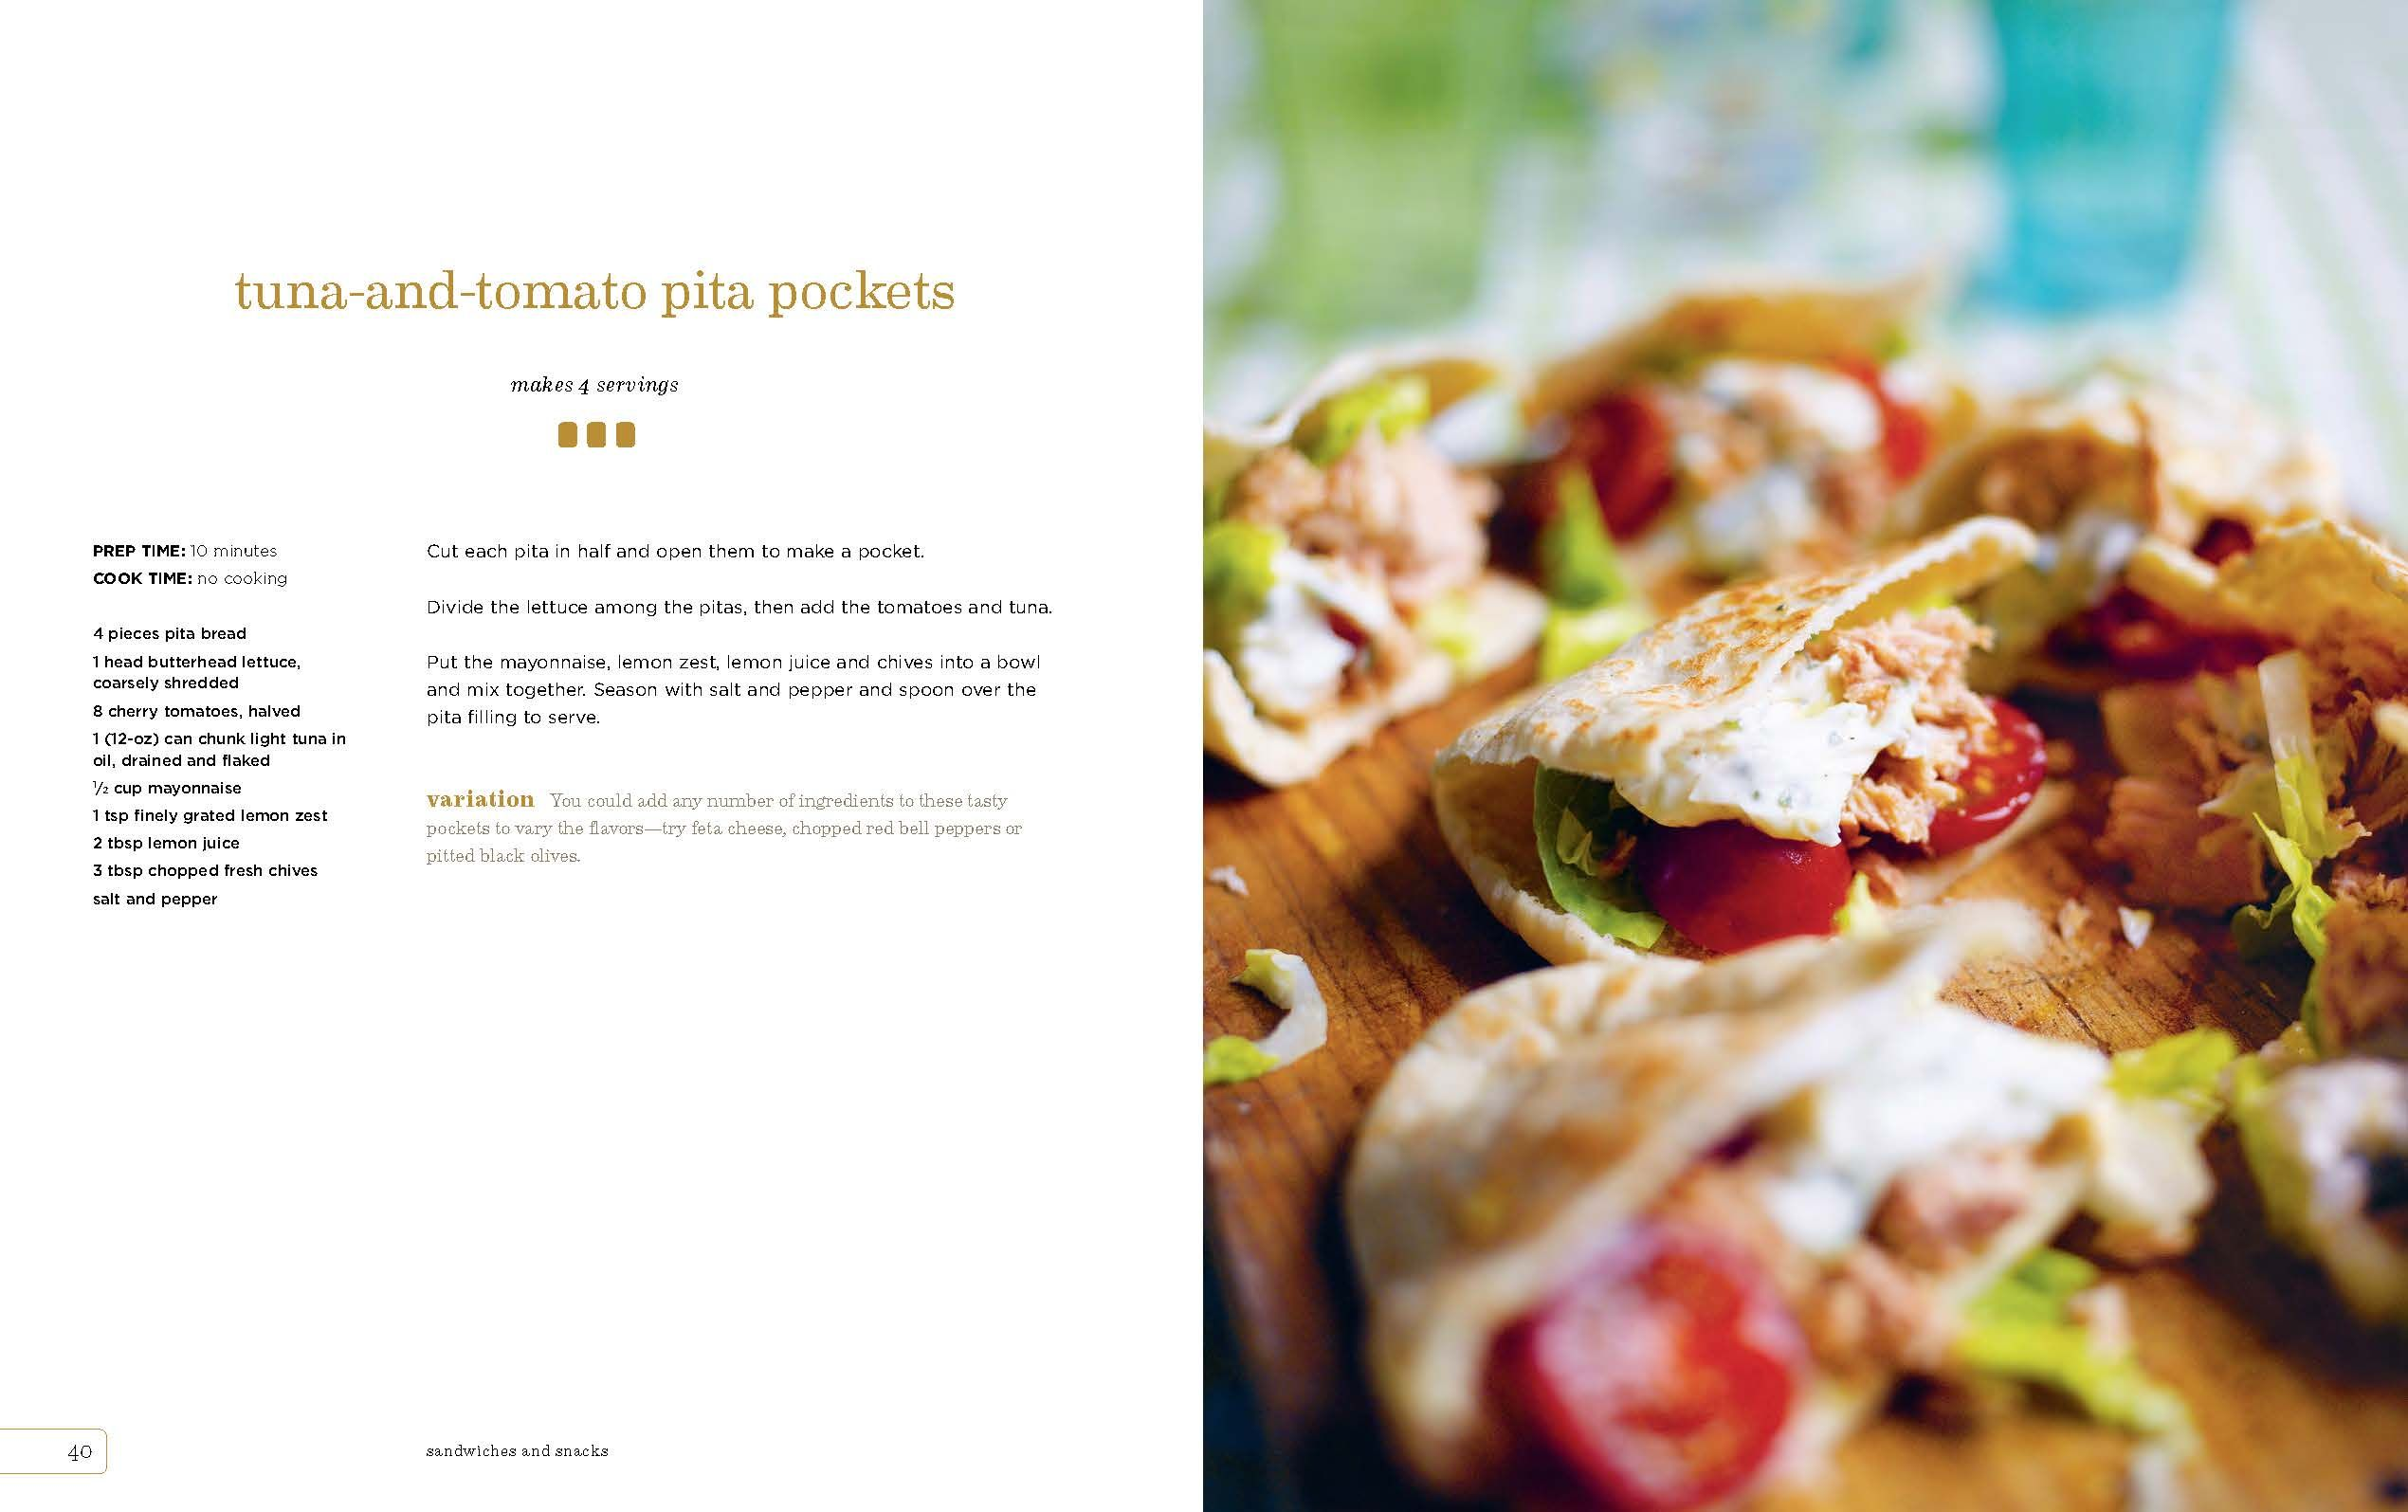 Tuna and tomato pita pockets #recipe | TLC KITCHEN | Pinterest ...